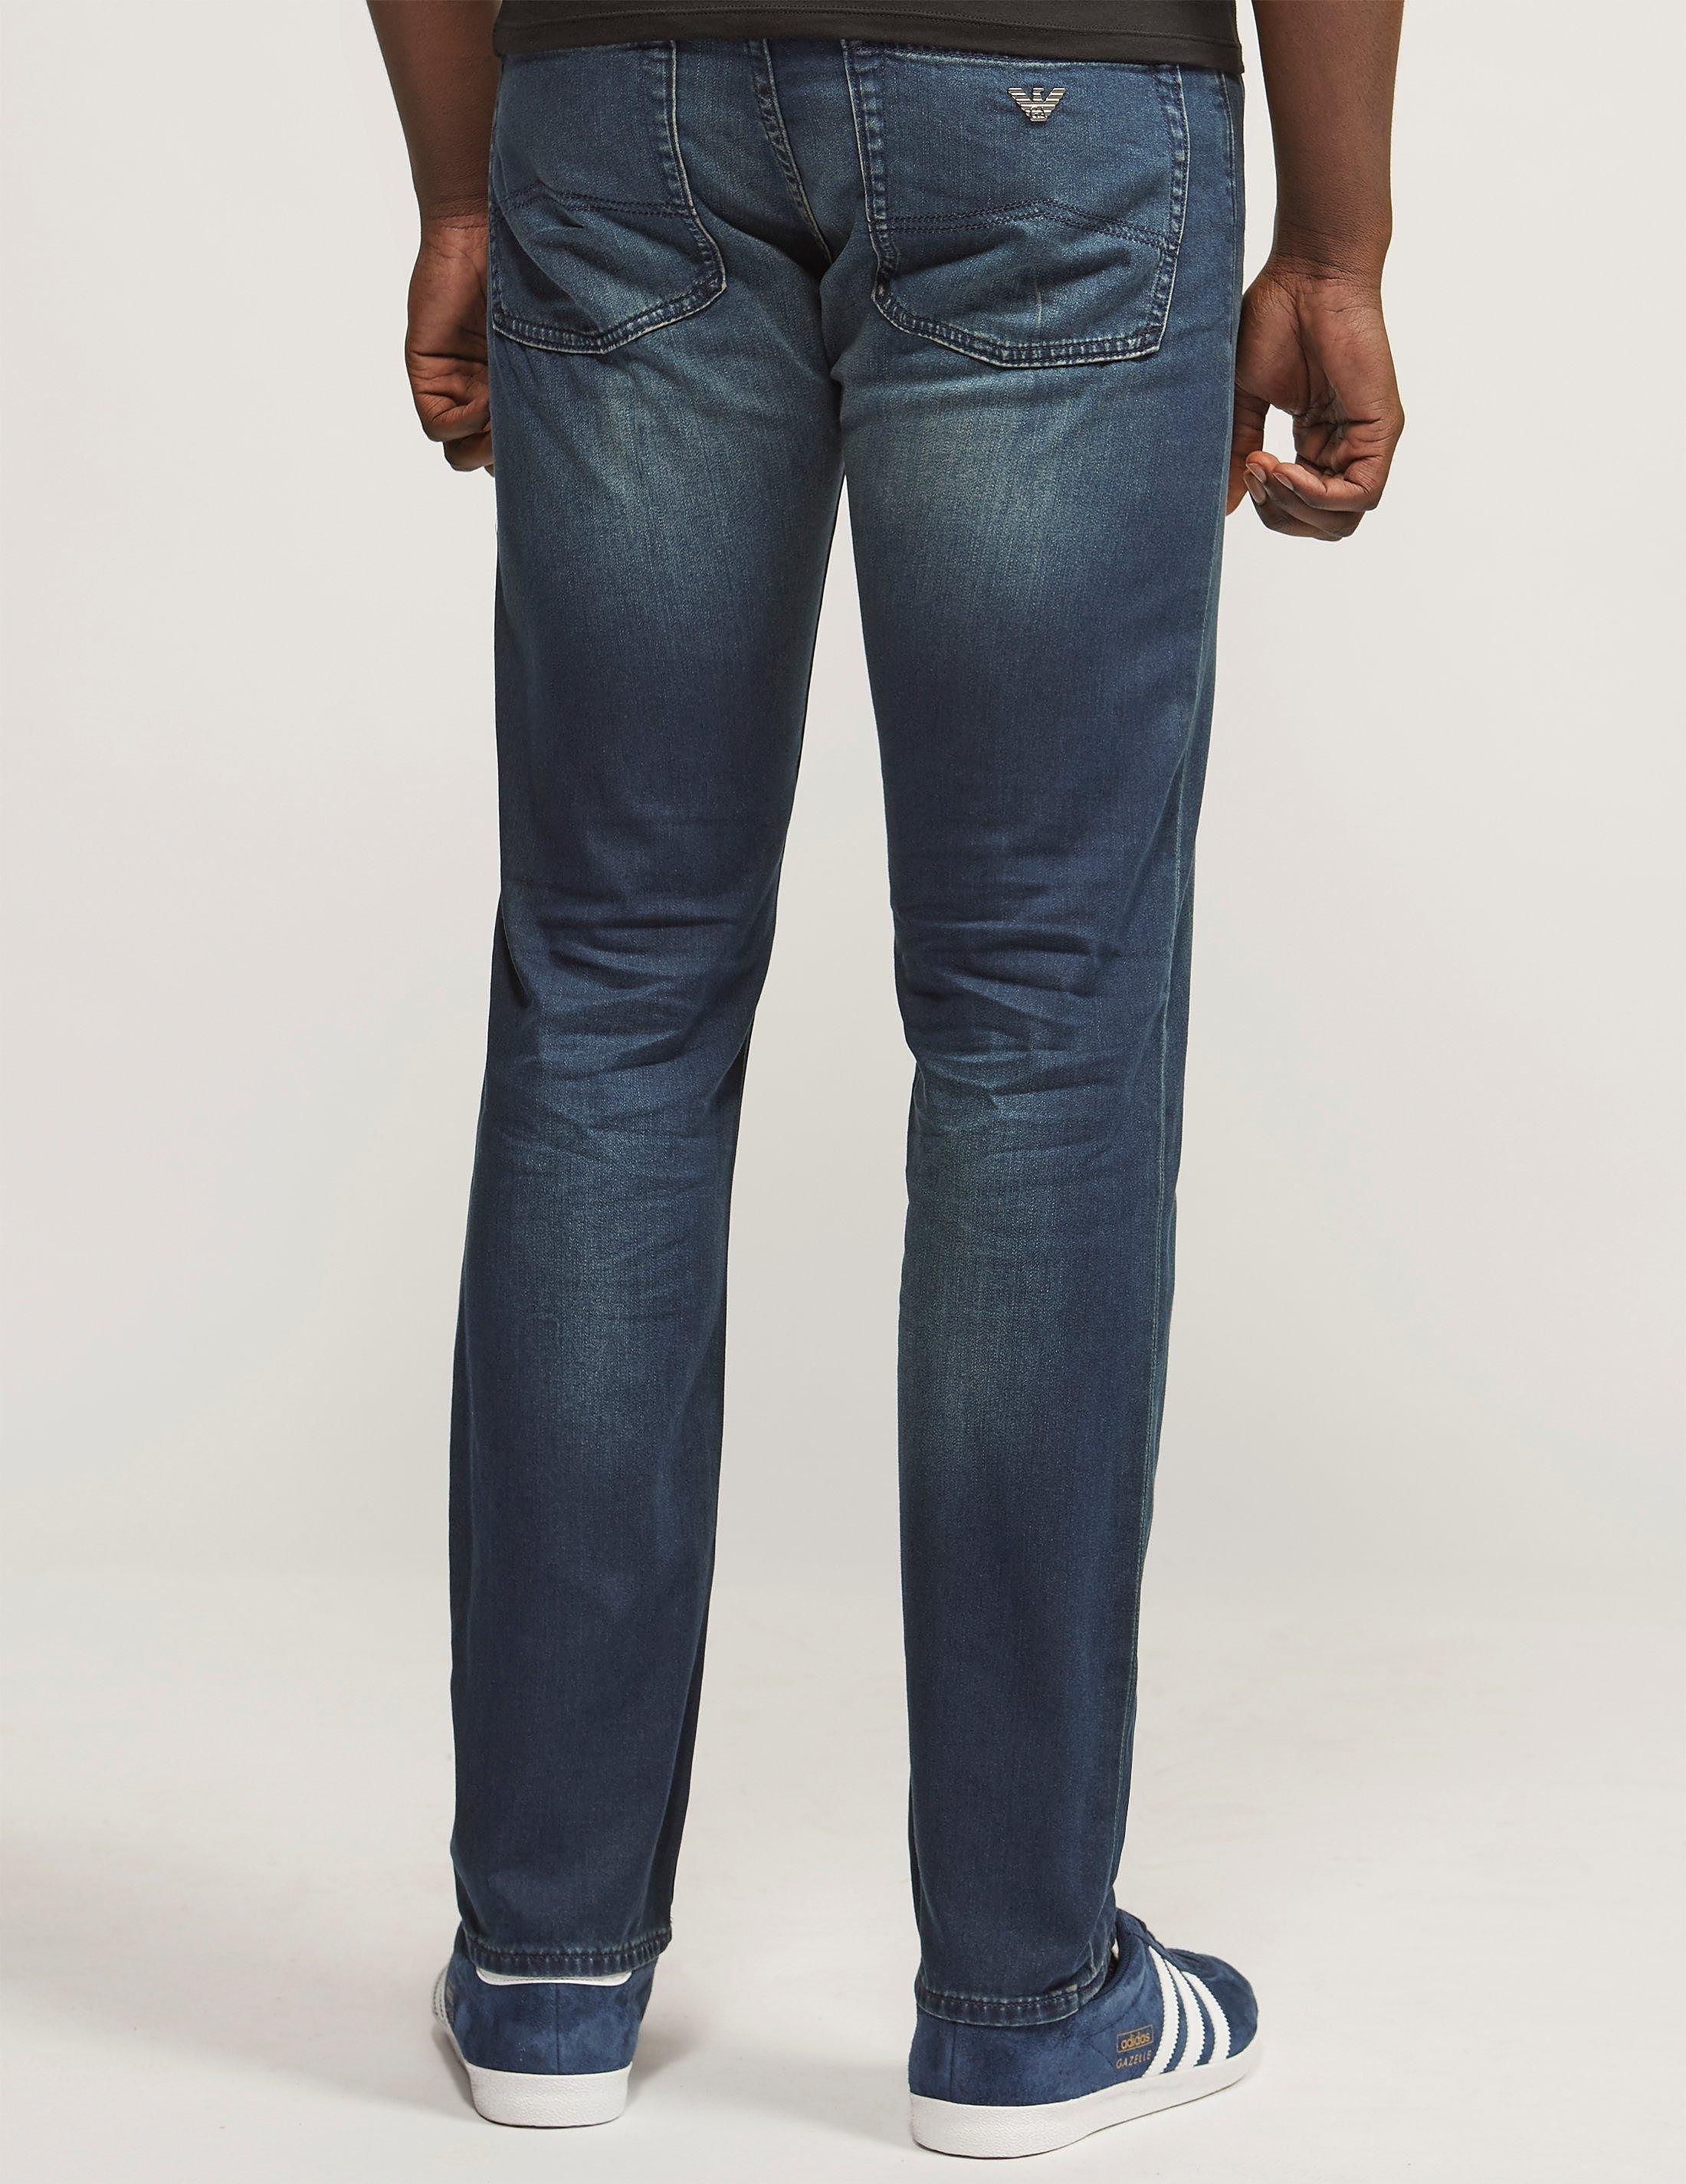 Armani Jeans J45 Regular Fit Jeans